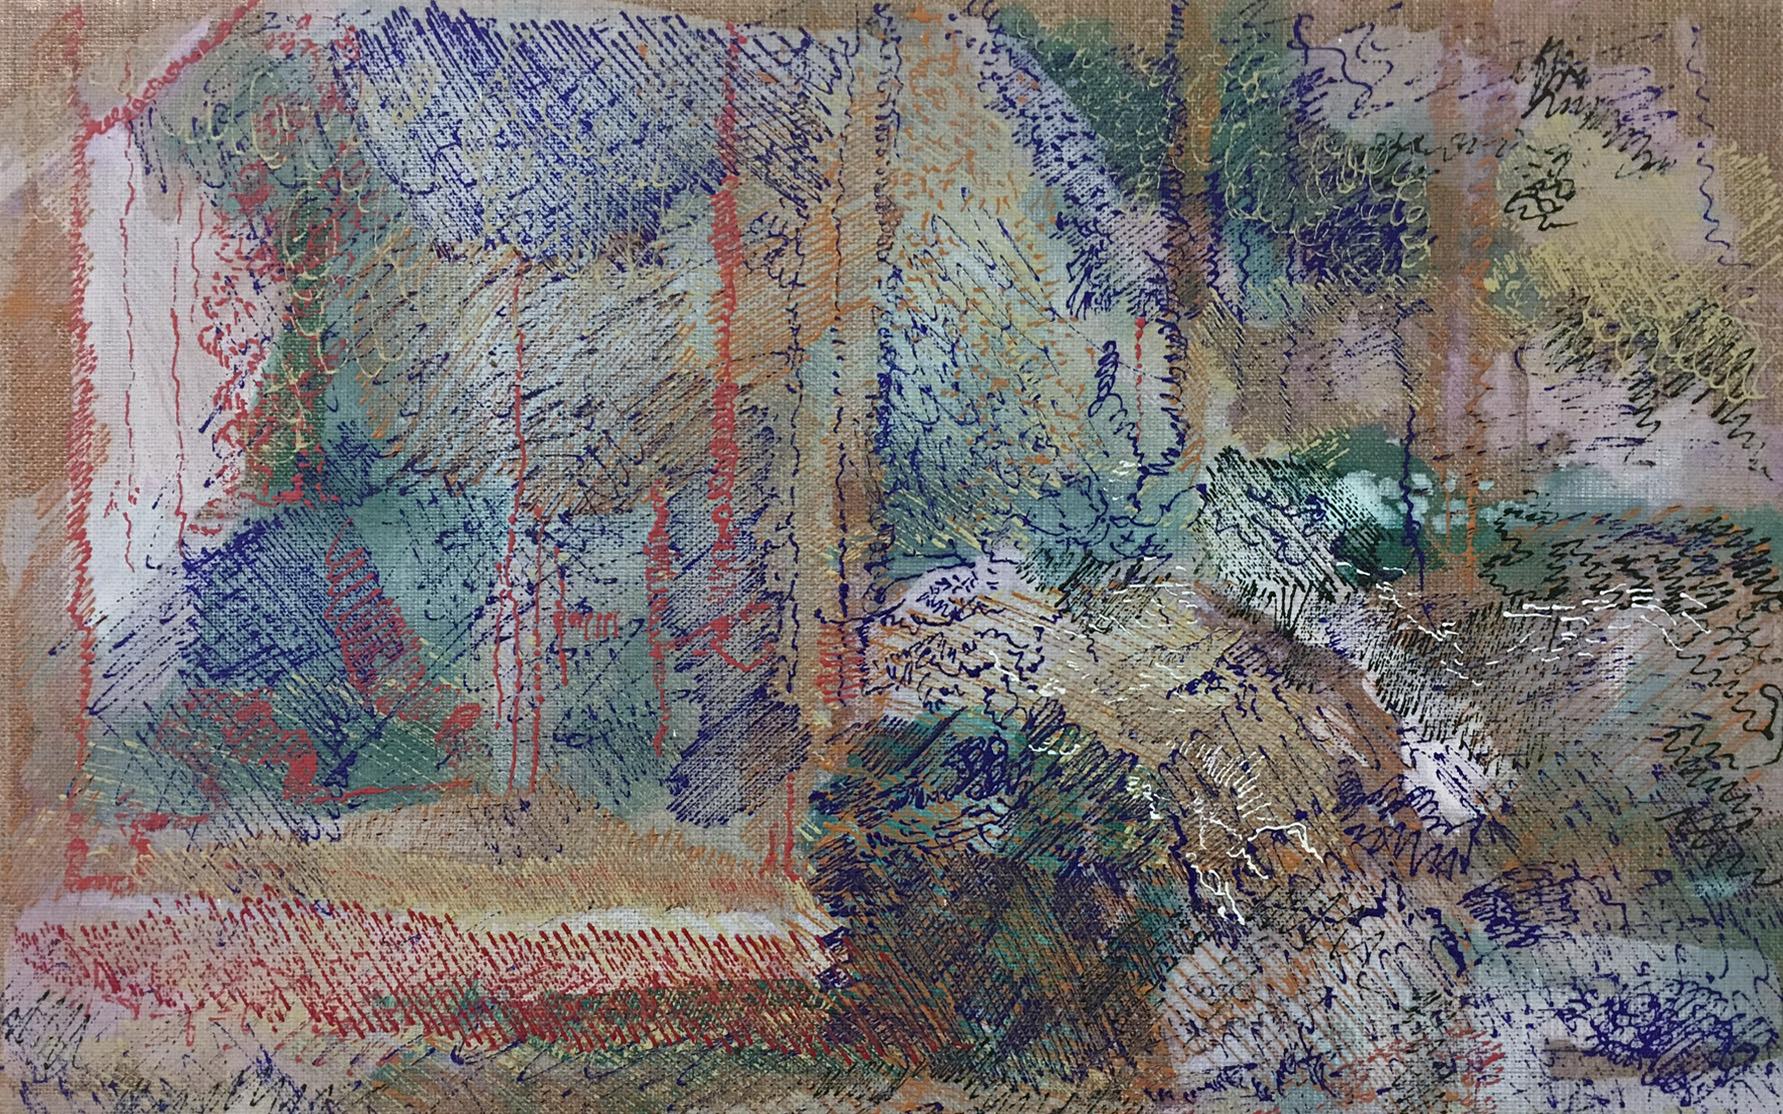 Galerie3 | Matthias Buch | Öl auf Leinwand | 2017 | cut